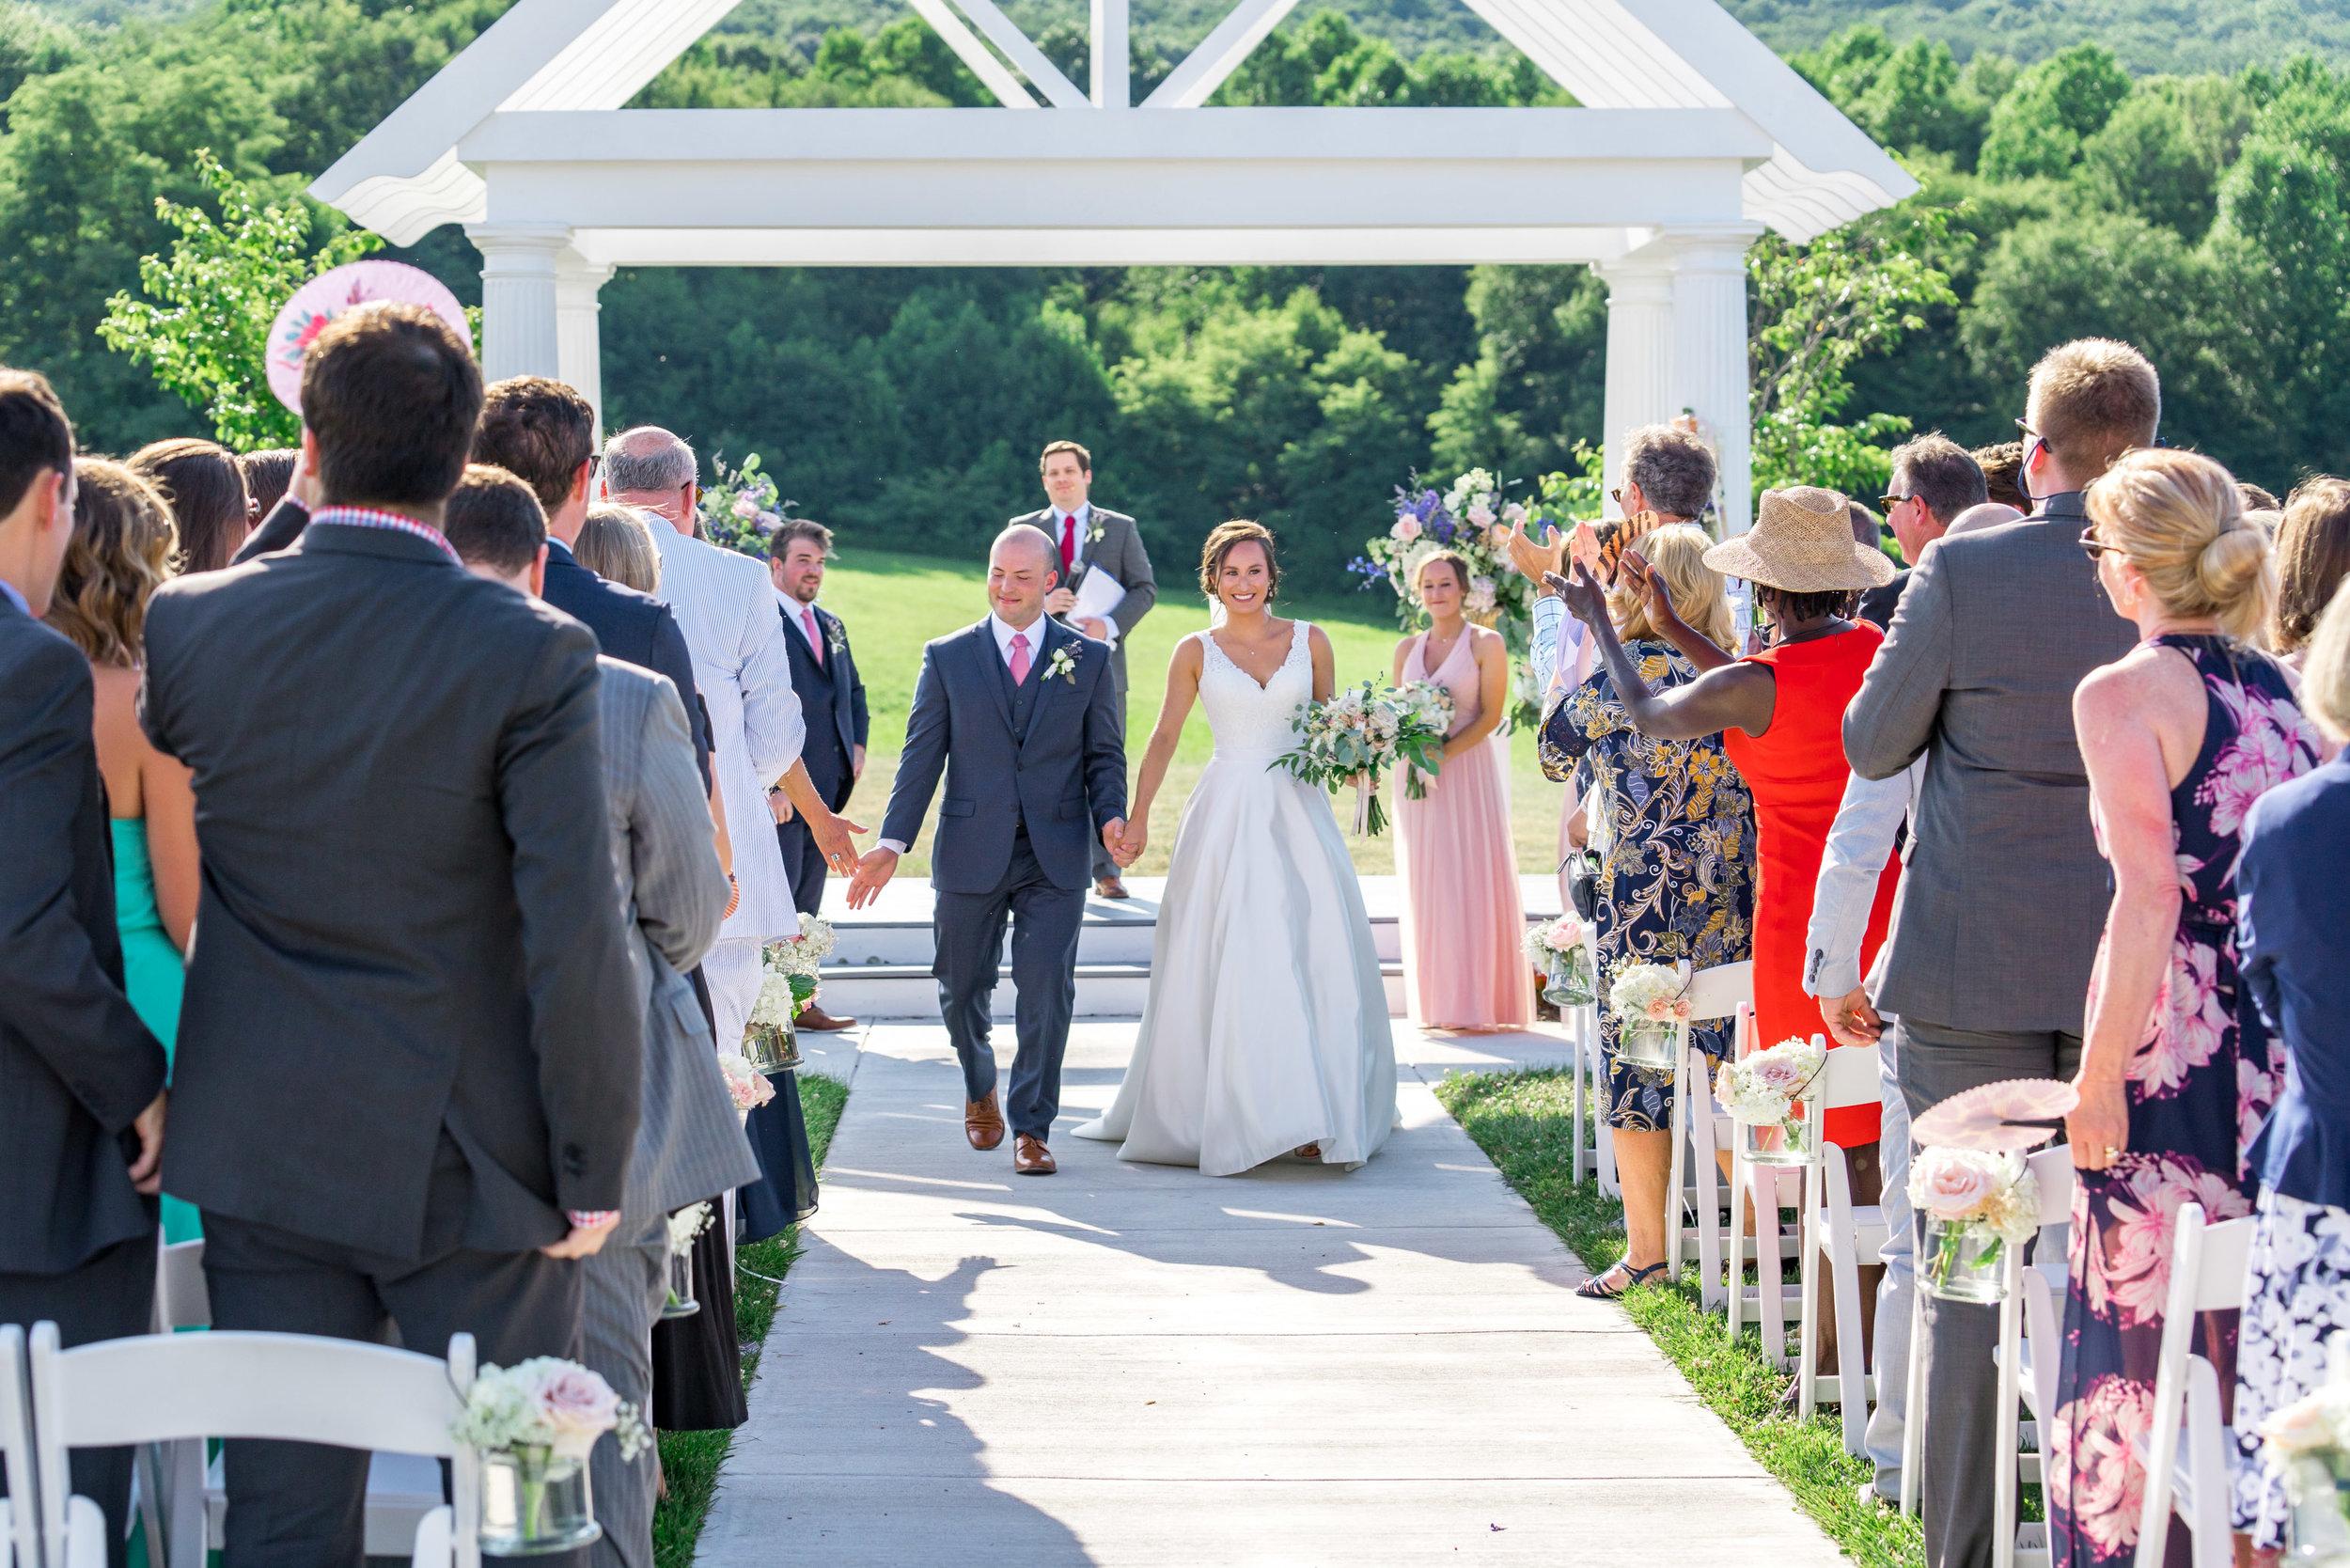 Wedding photos by Jessica Nazarova at Springfield lavender fields